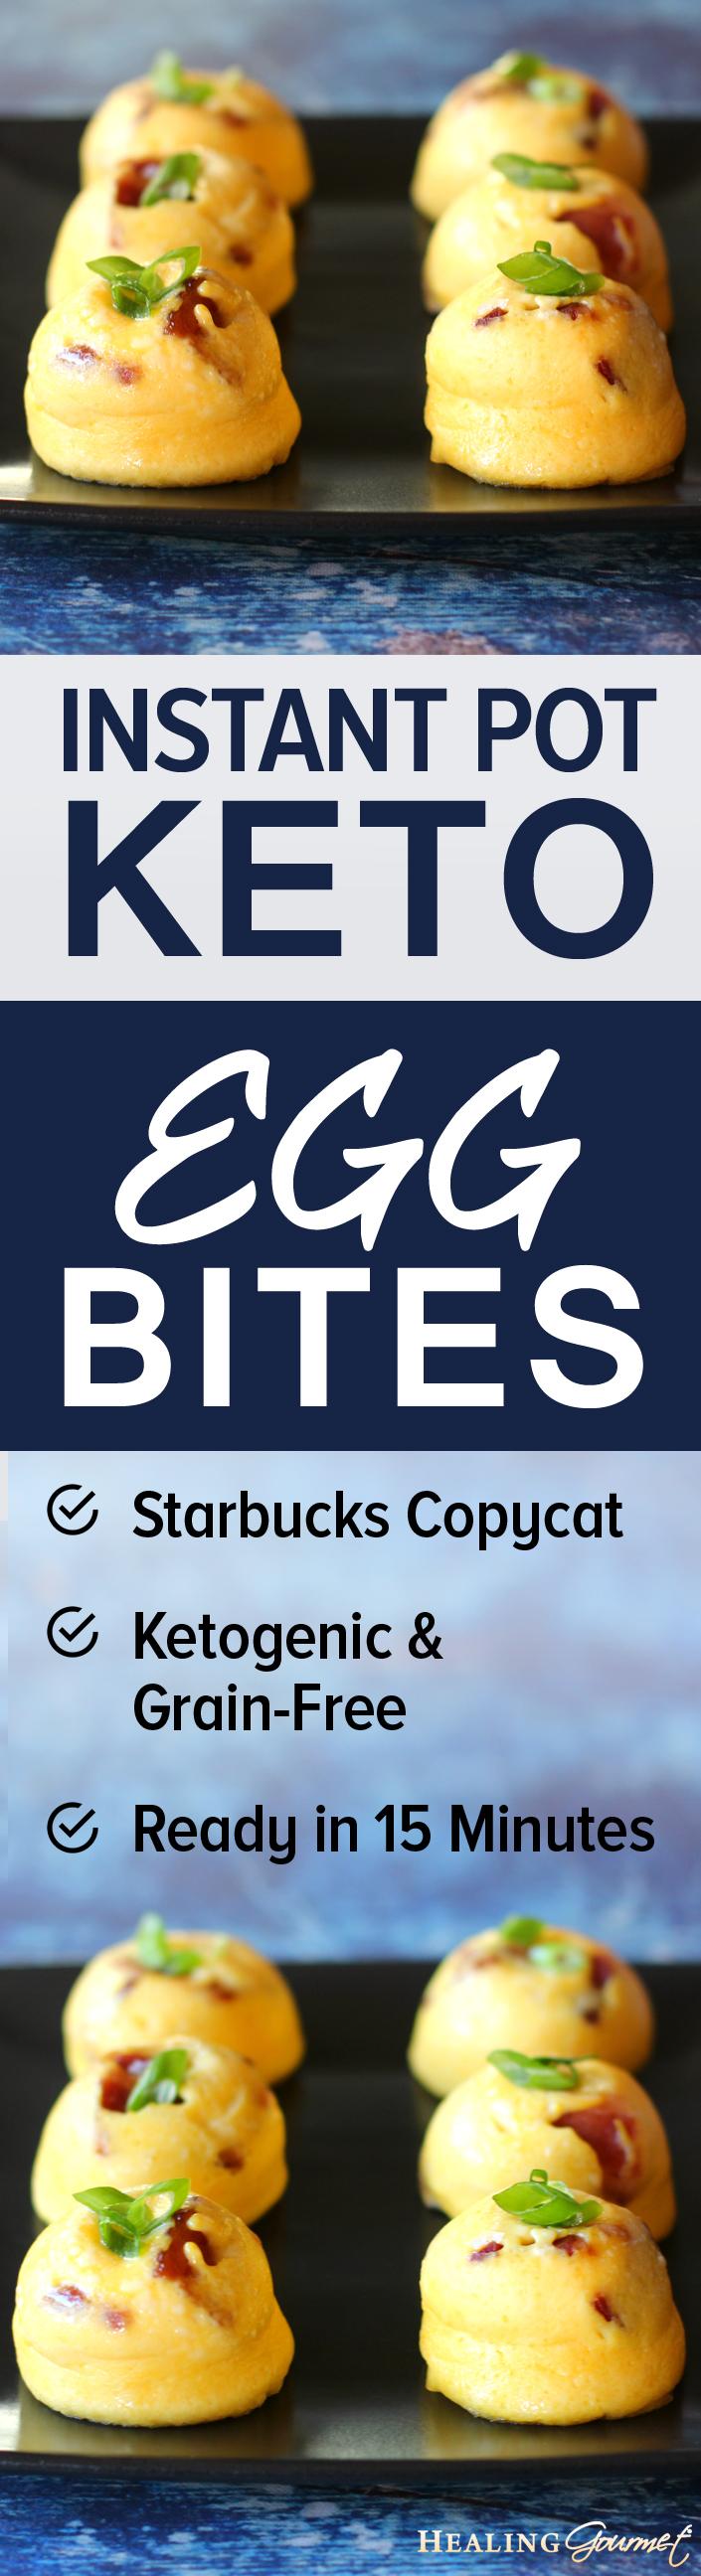 Instant Pot Sous Vide Egg Bites